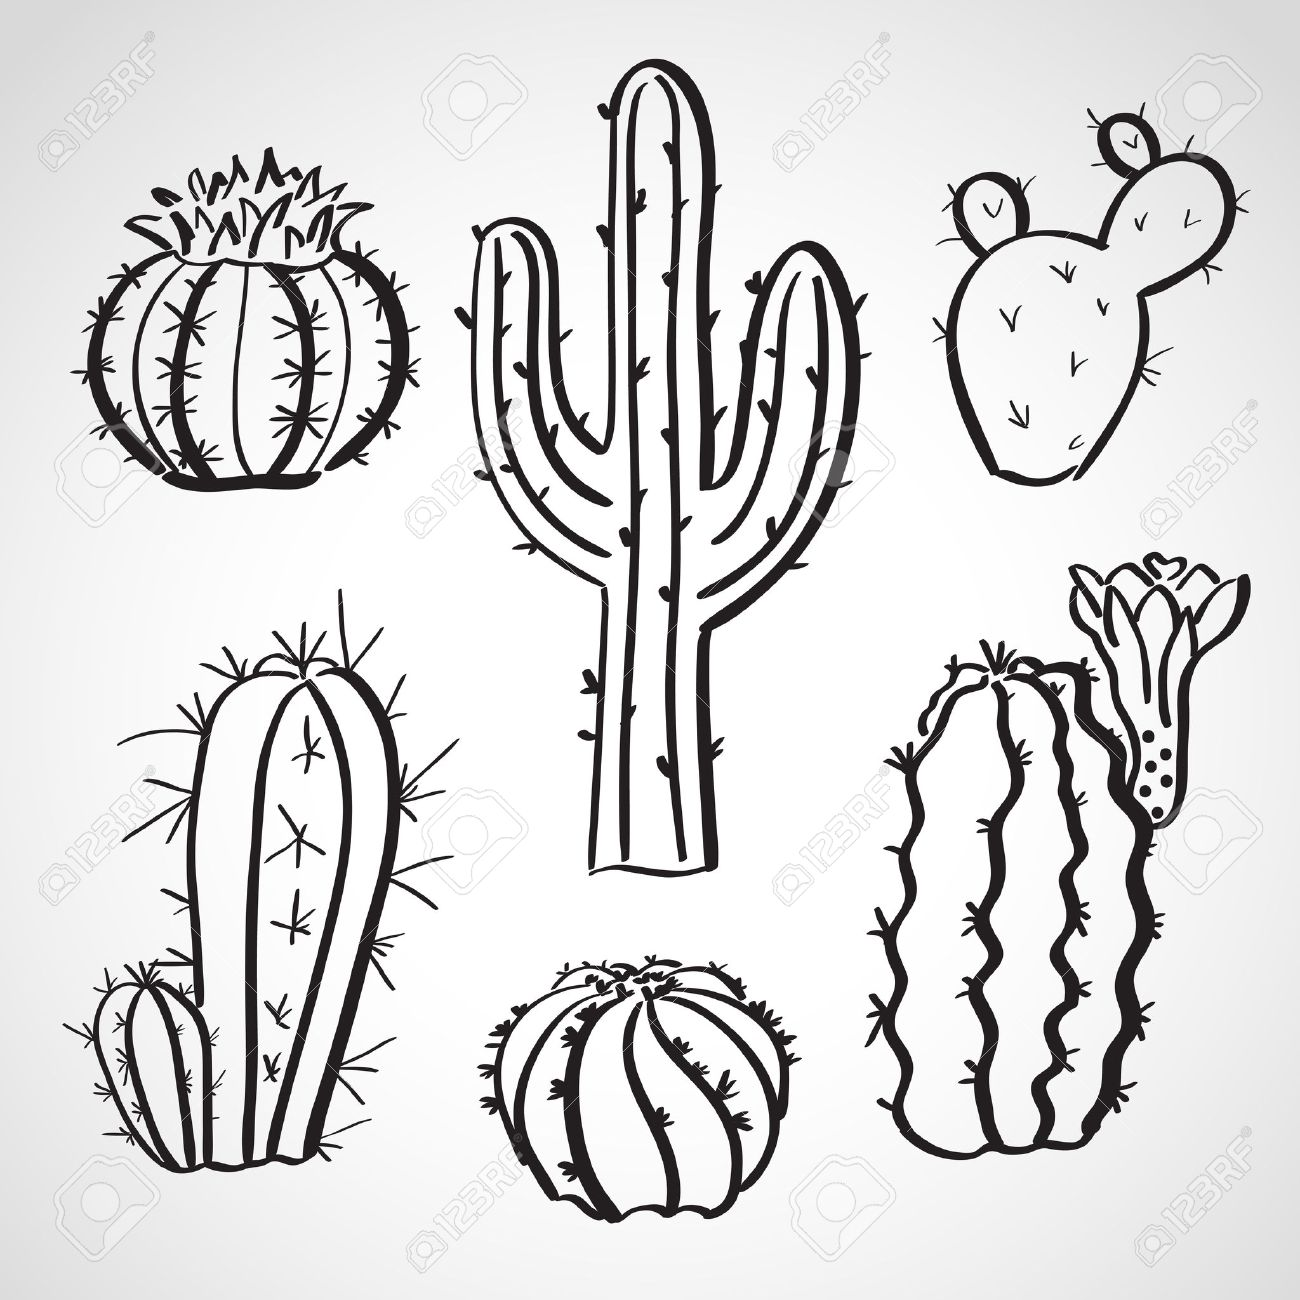 Ink style hand drawn sketch set - cactus set - 23869045